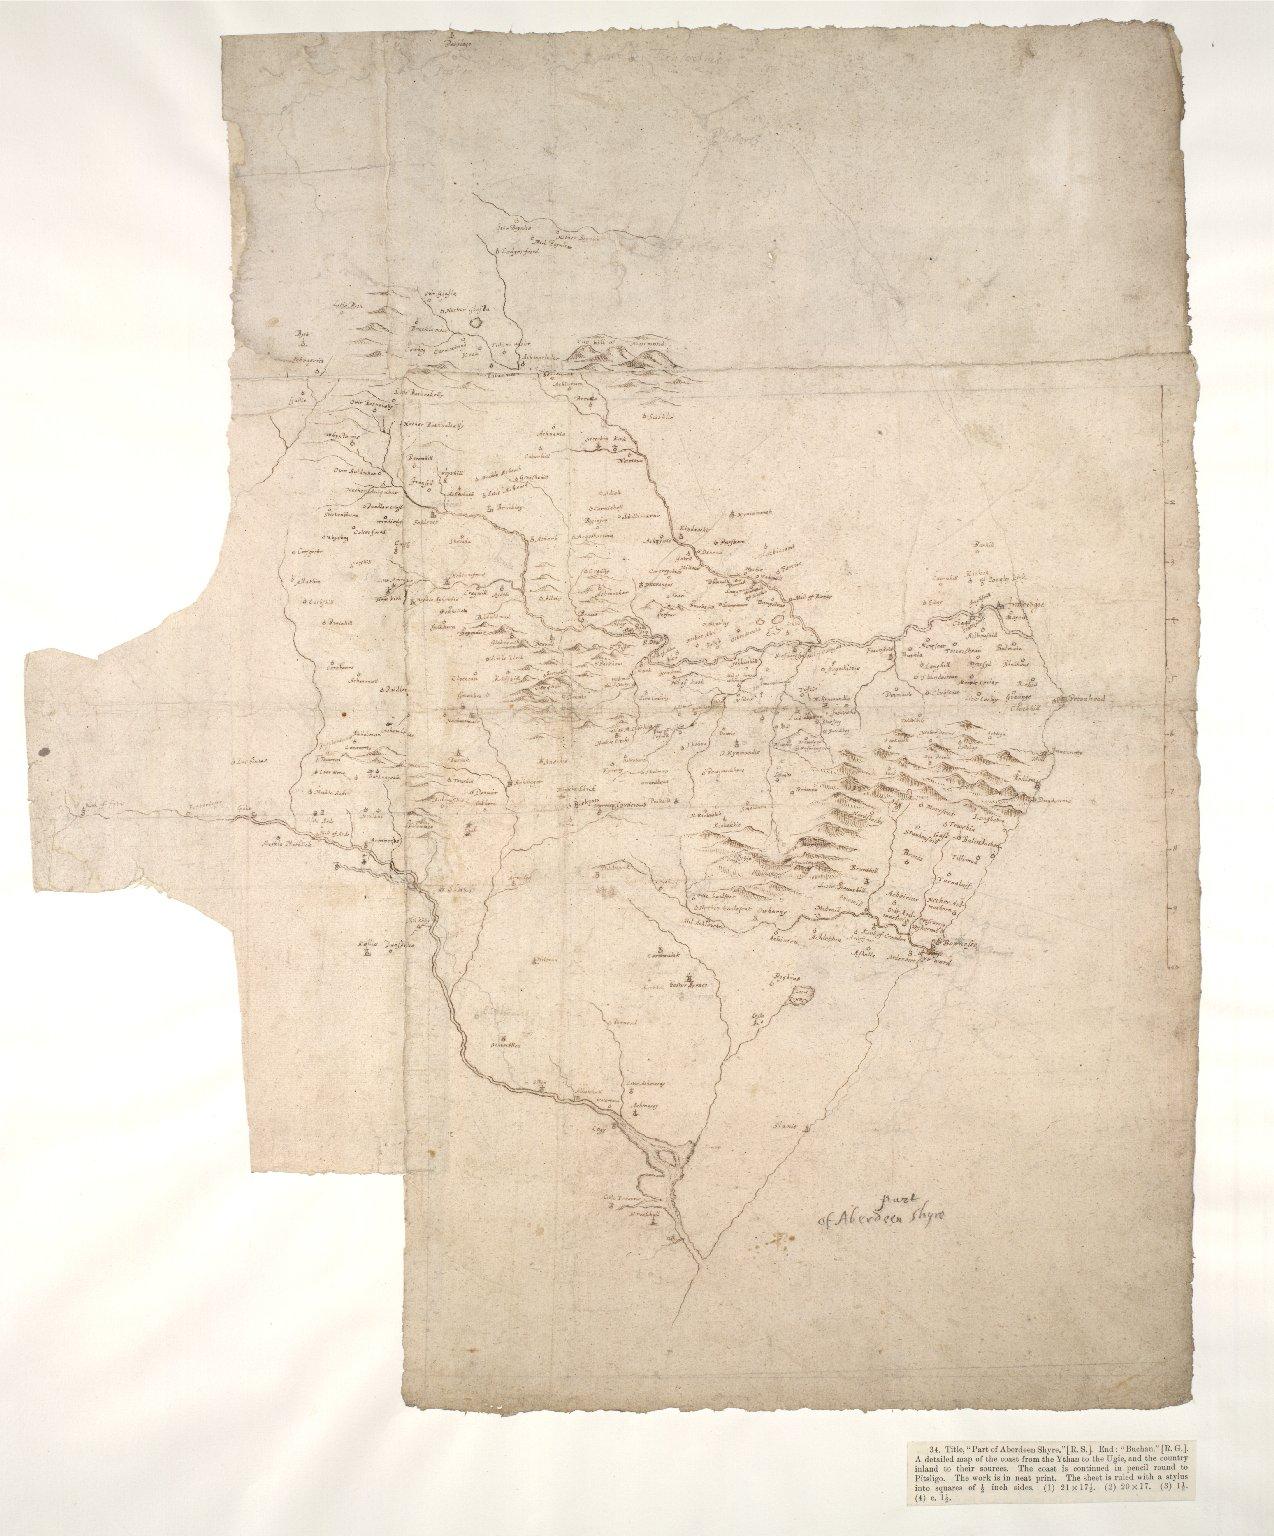 Part of Aberdeen Shyre [1 of 1]